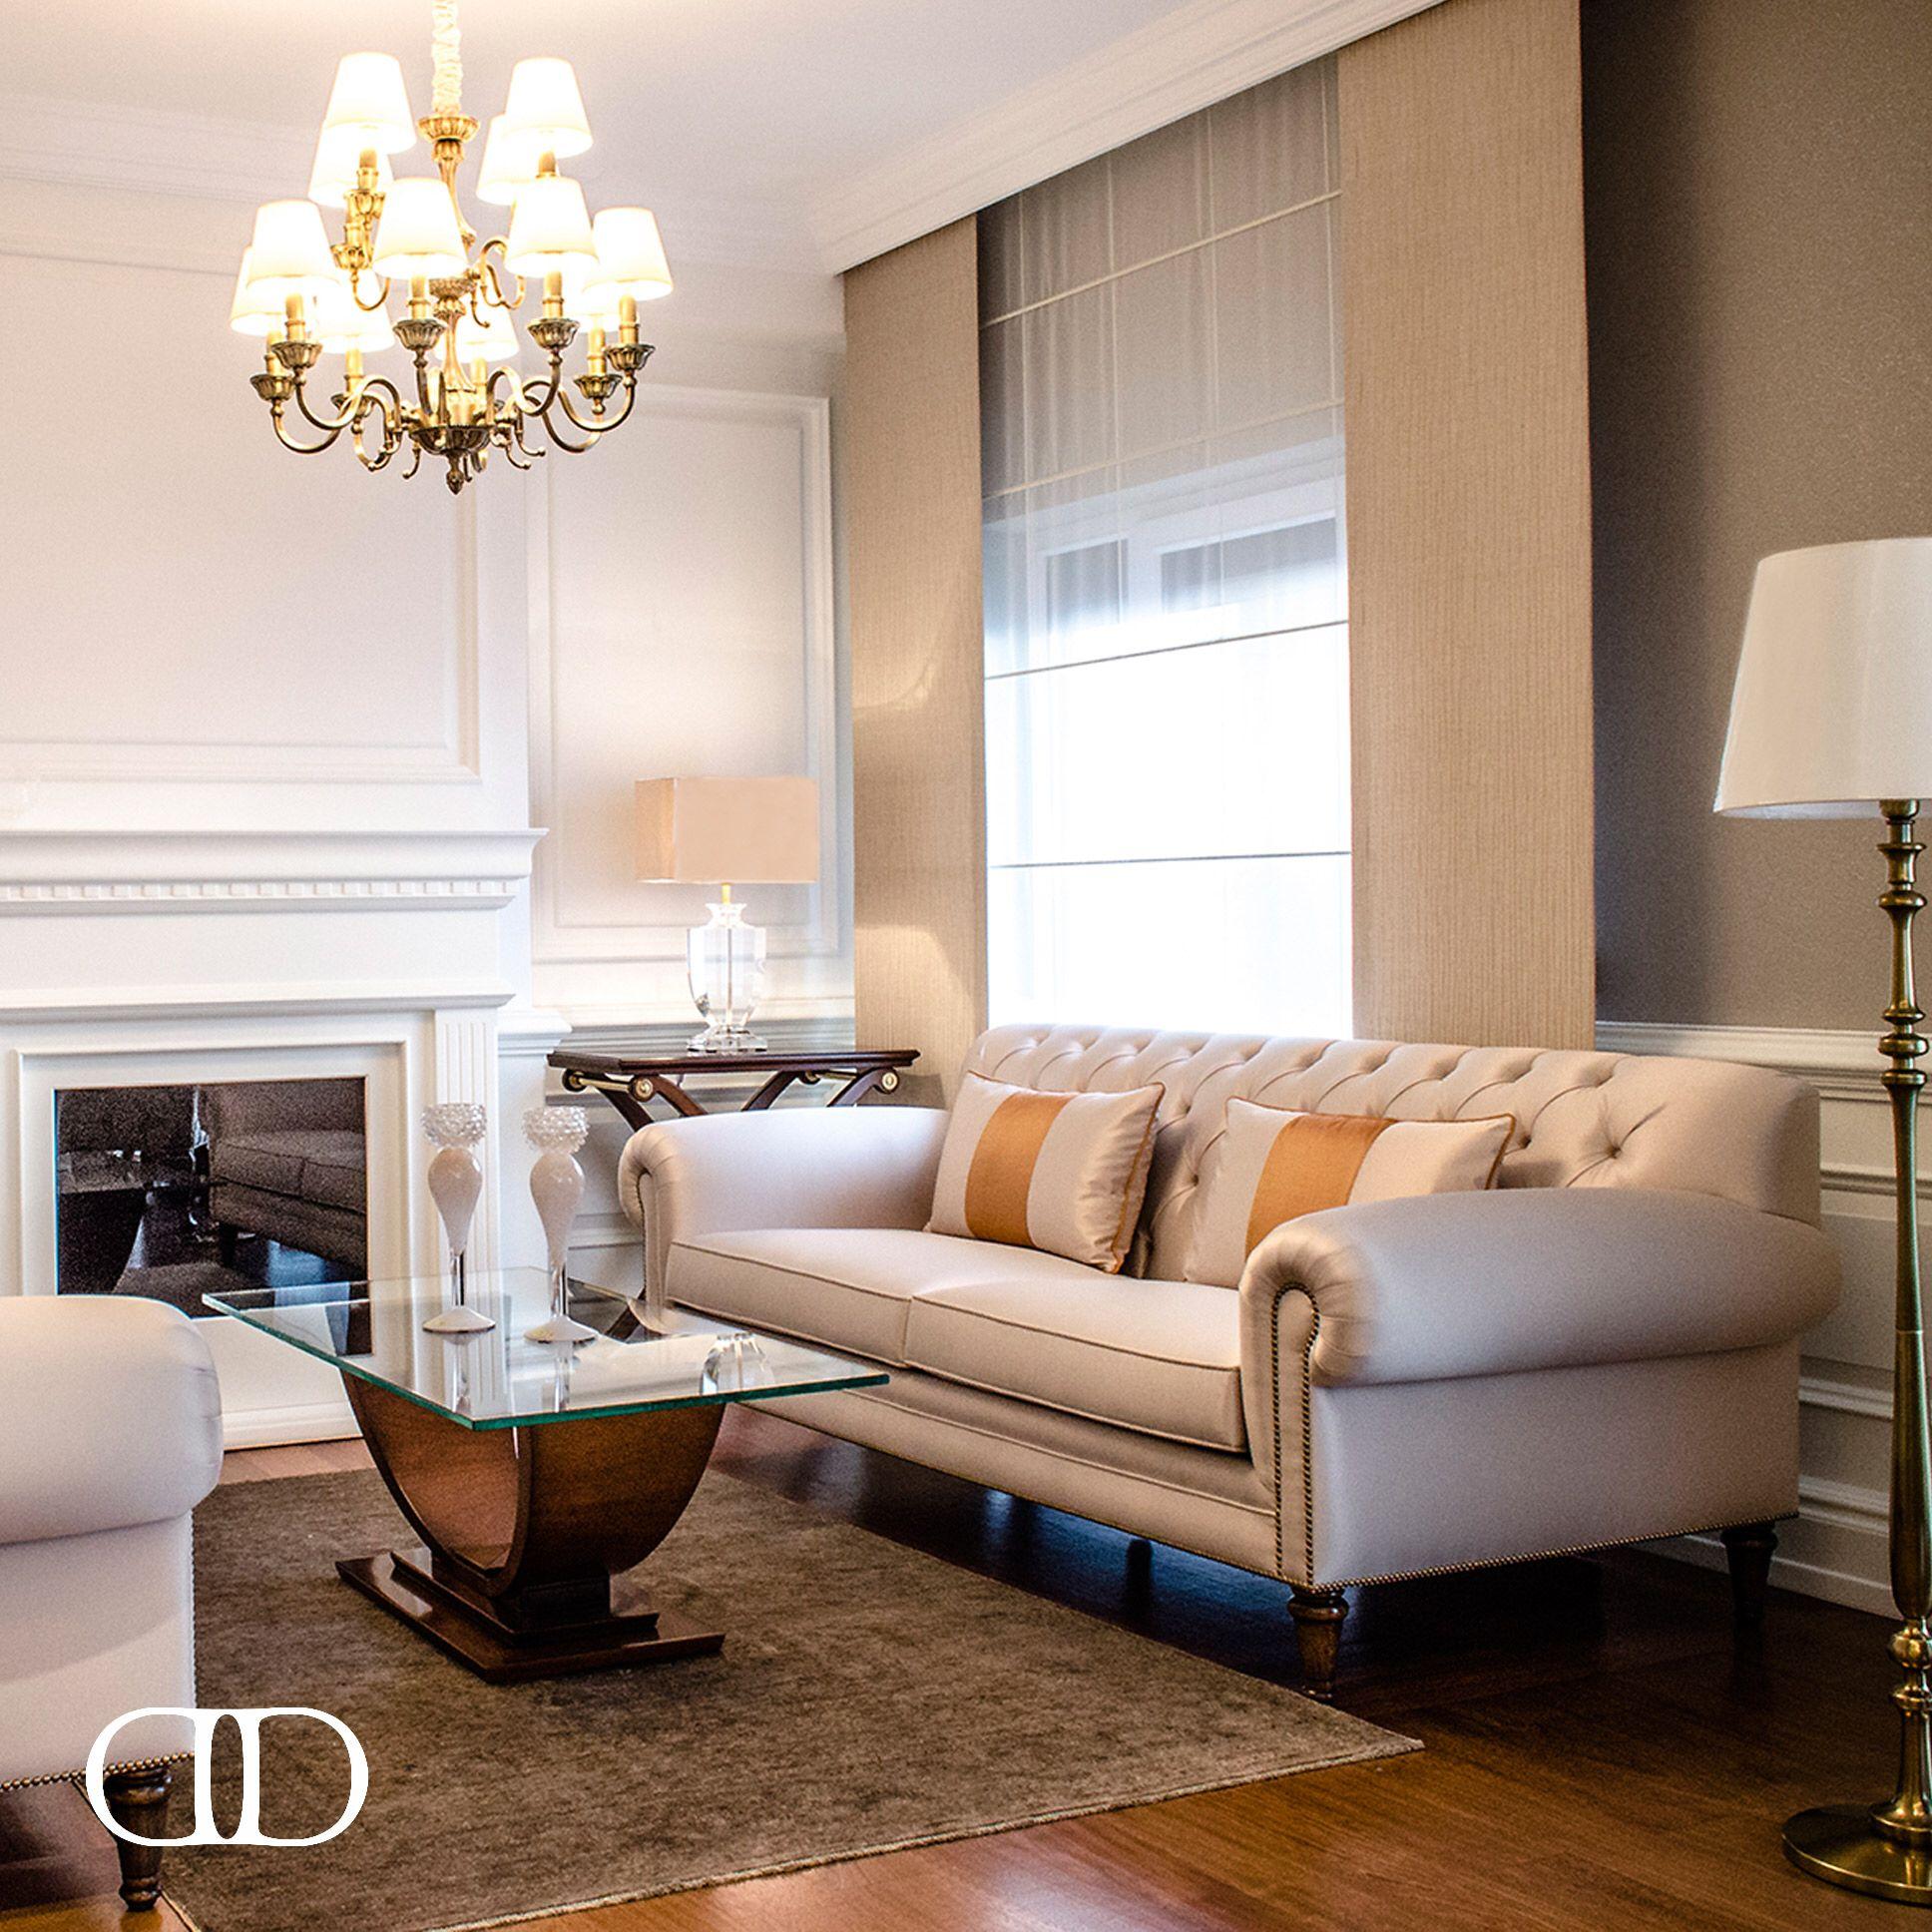 Always Chic Dorya s Dorian Sofa Veneto Cocktail Table and Delaney